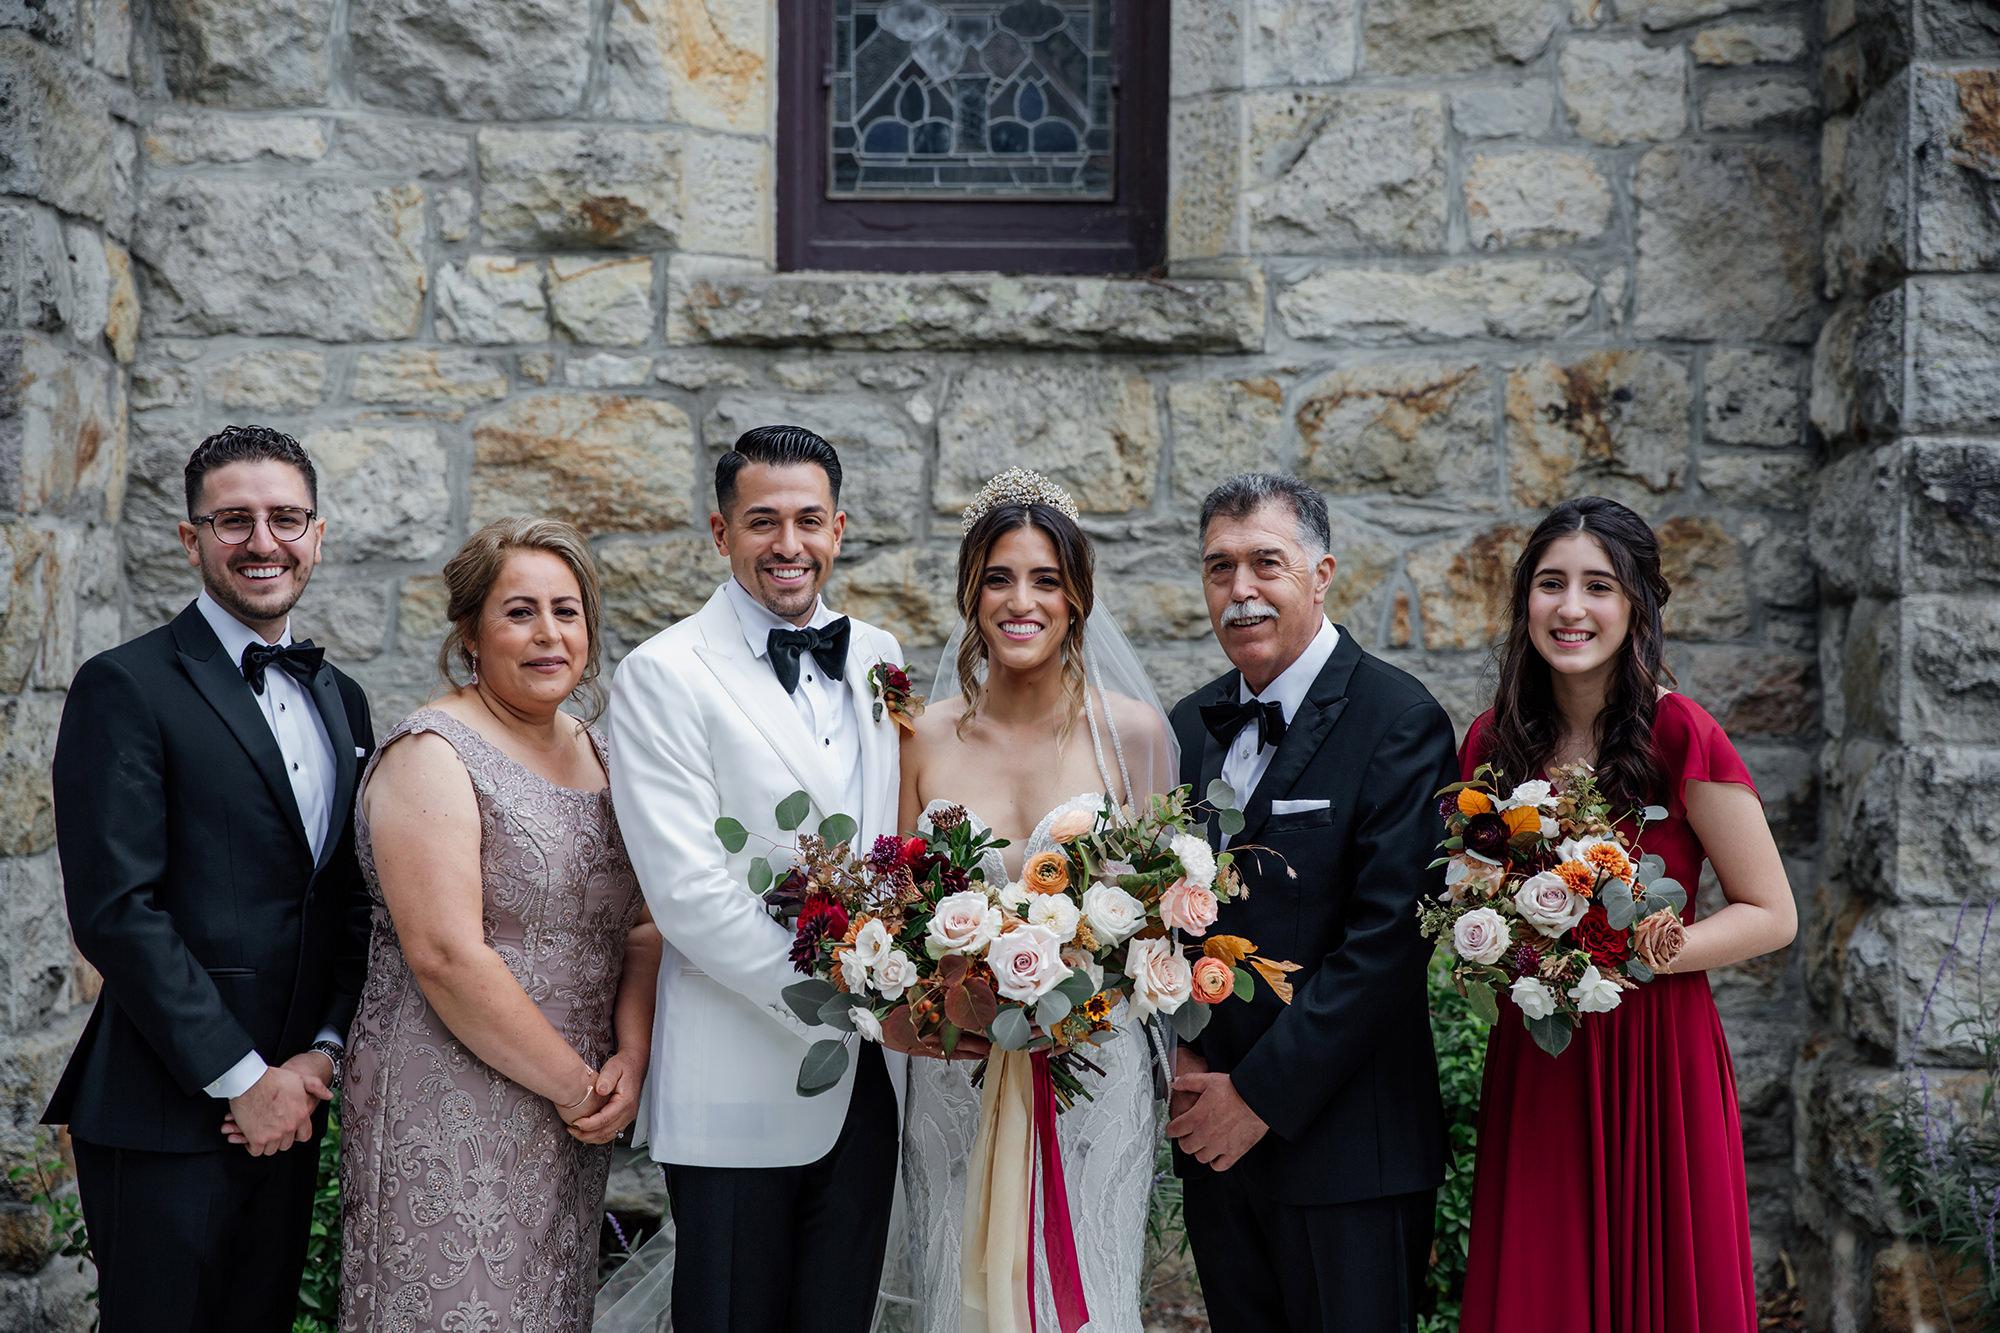 Family photos after wedding ceremony at St Helena Catholic Church